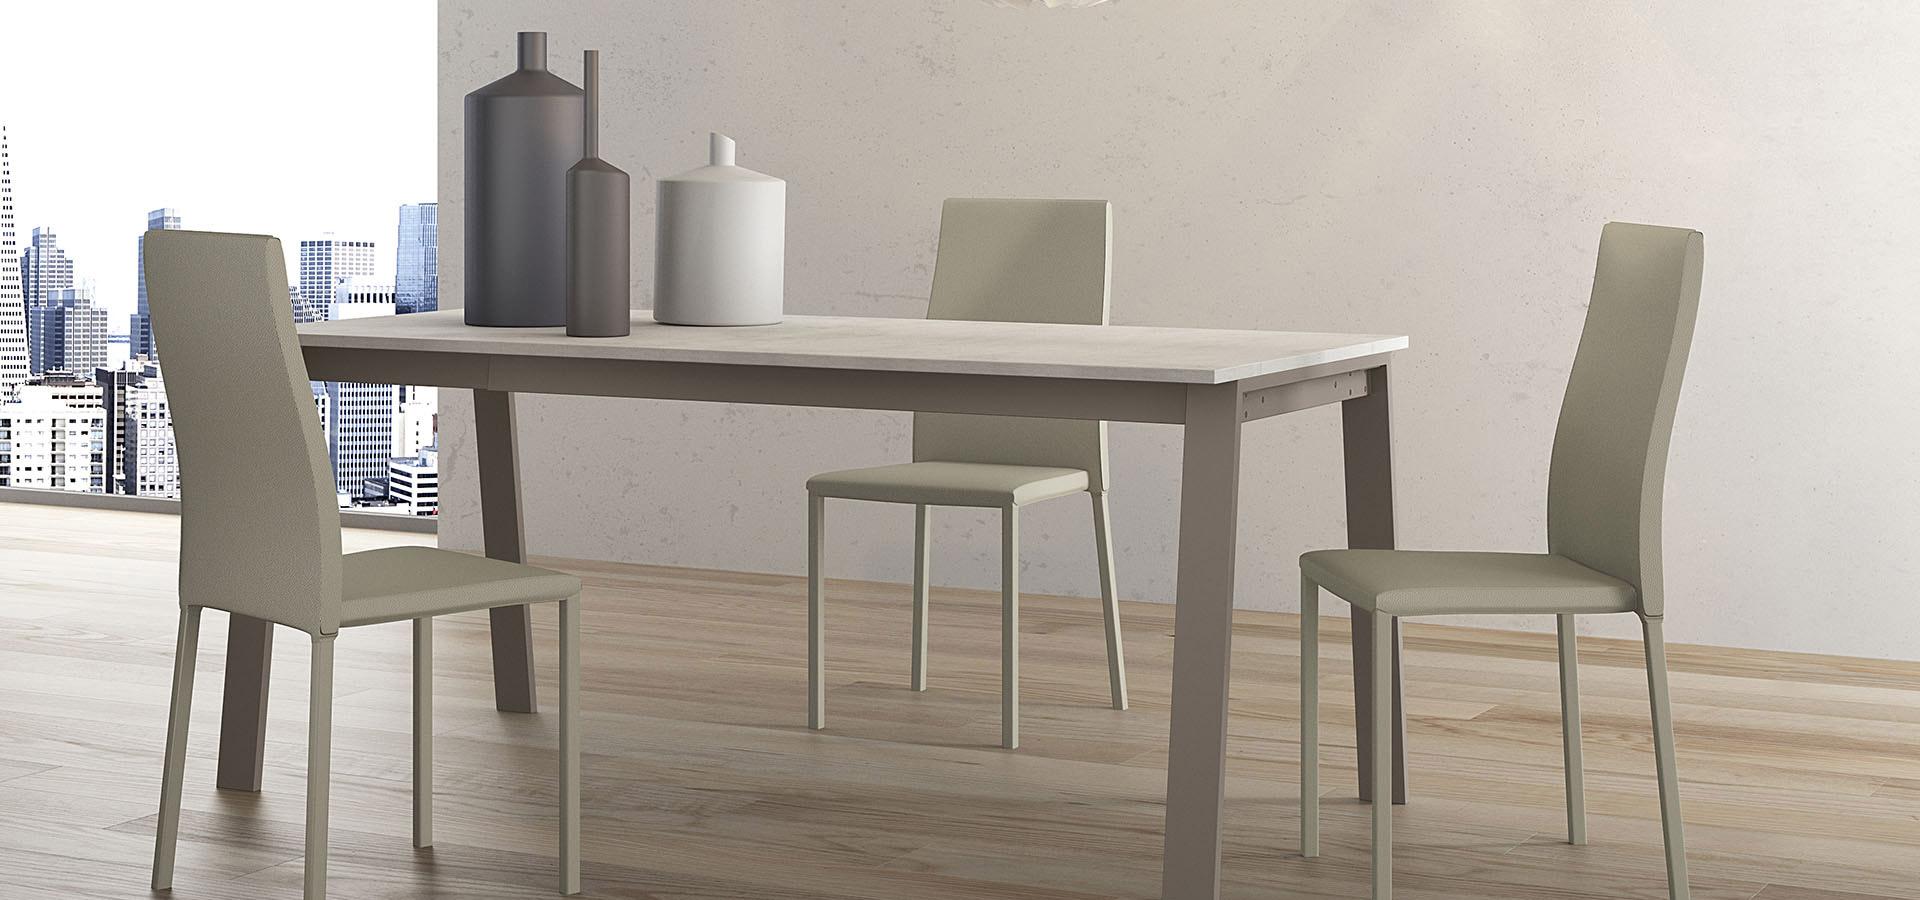 planet tavolo dining table arredo3